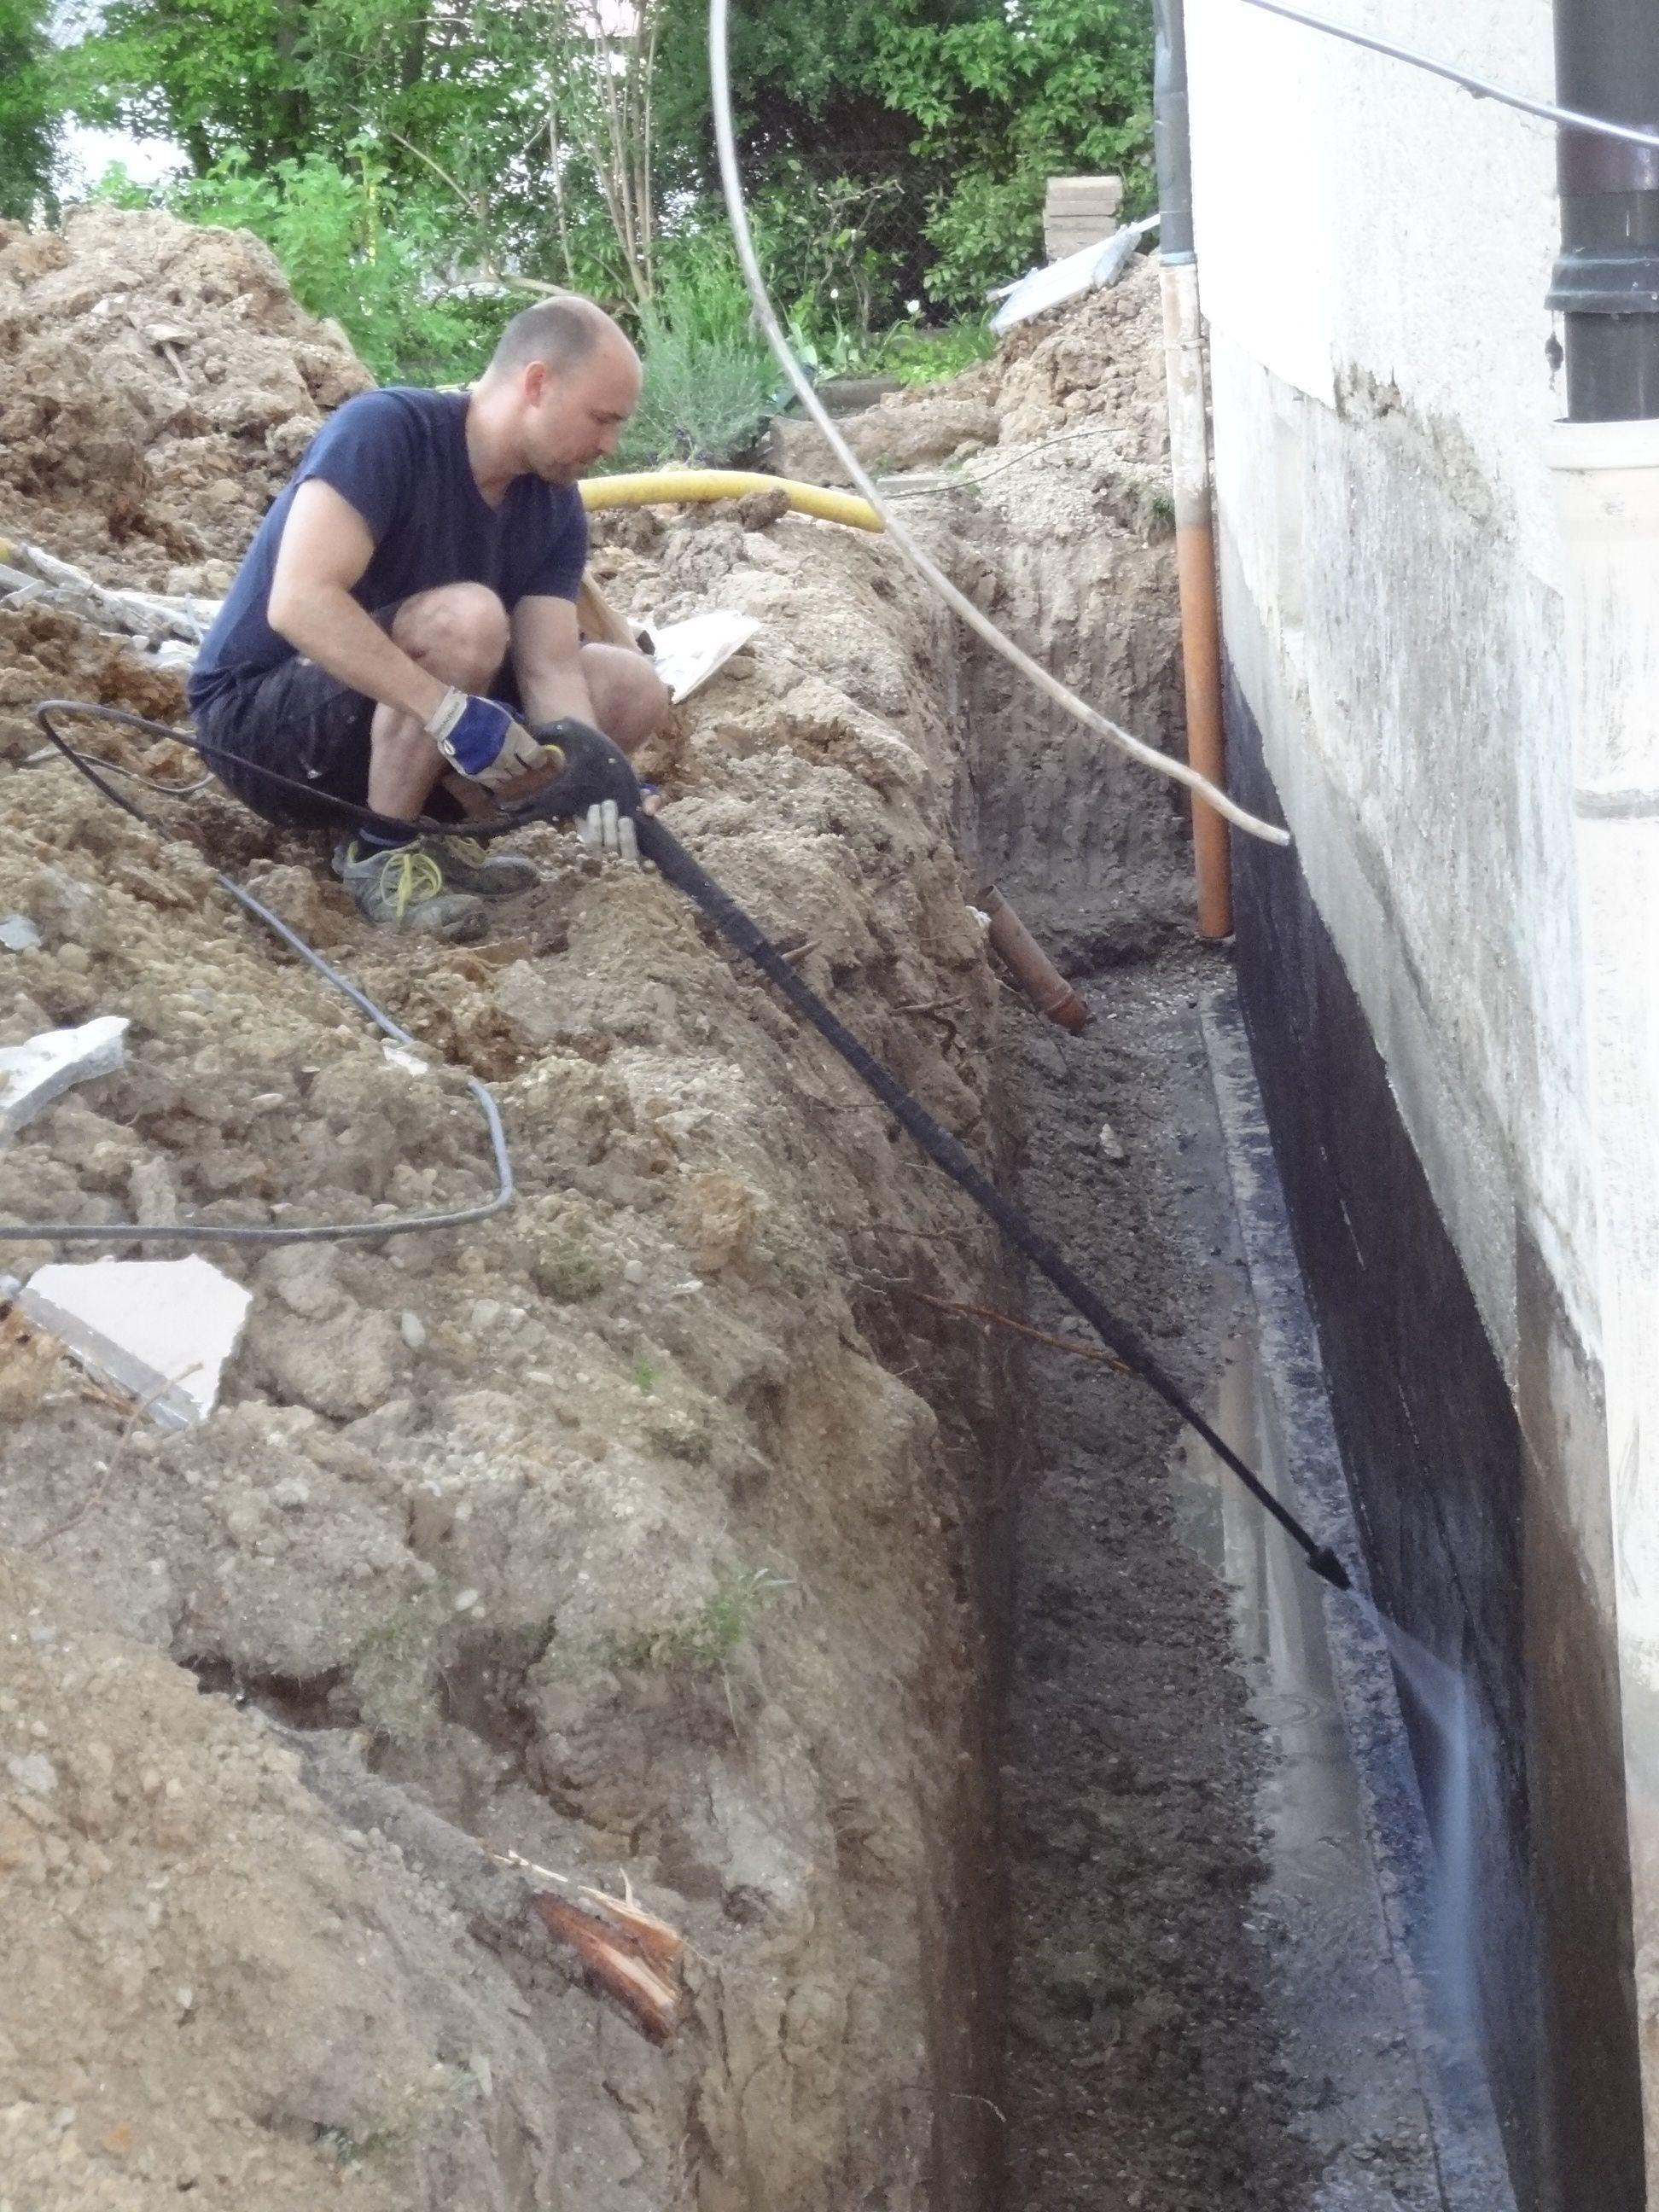 keller renovierung teil 3 abdichten isolieren uvm in 2020 basement remodeling